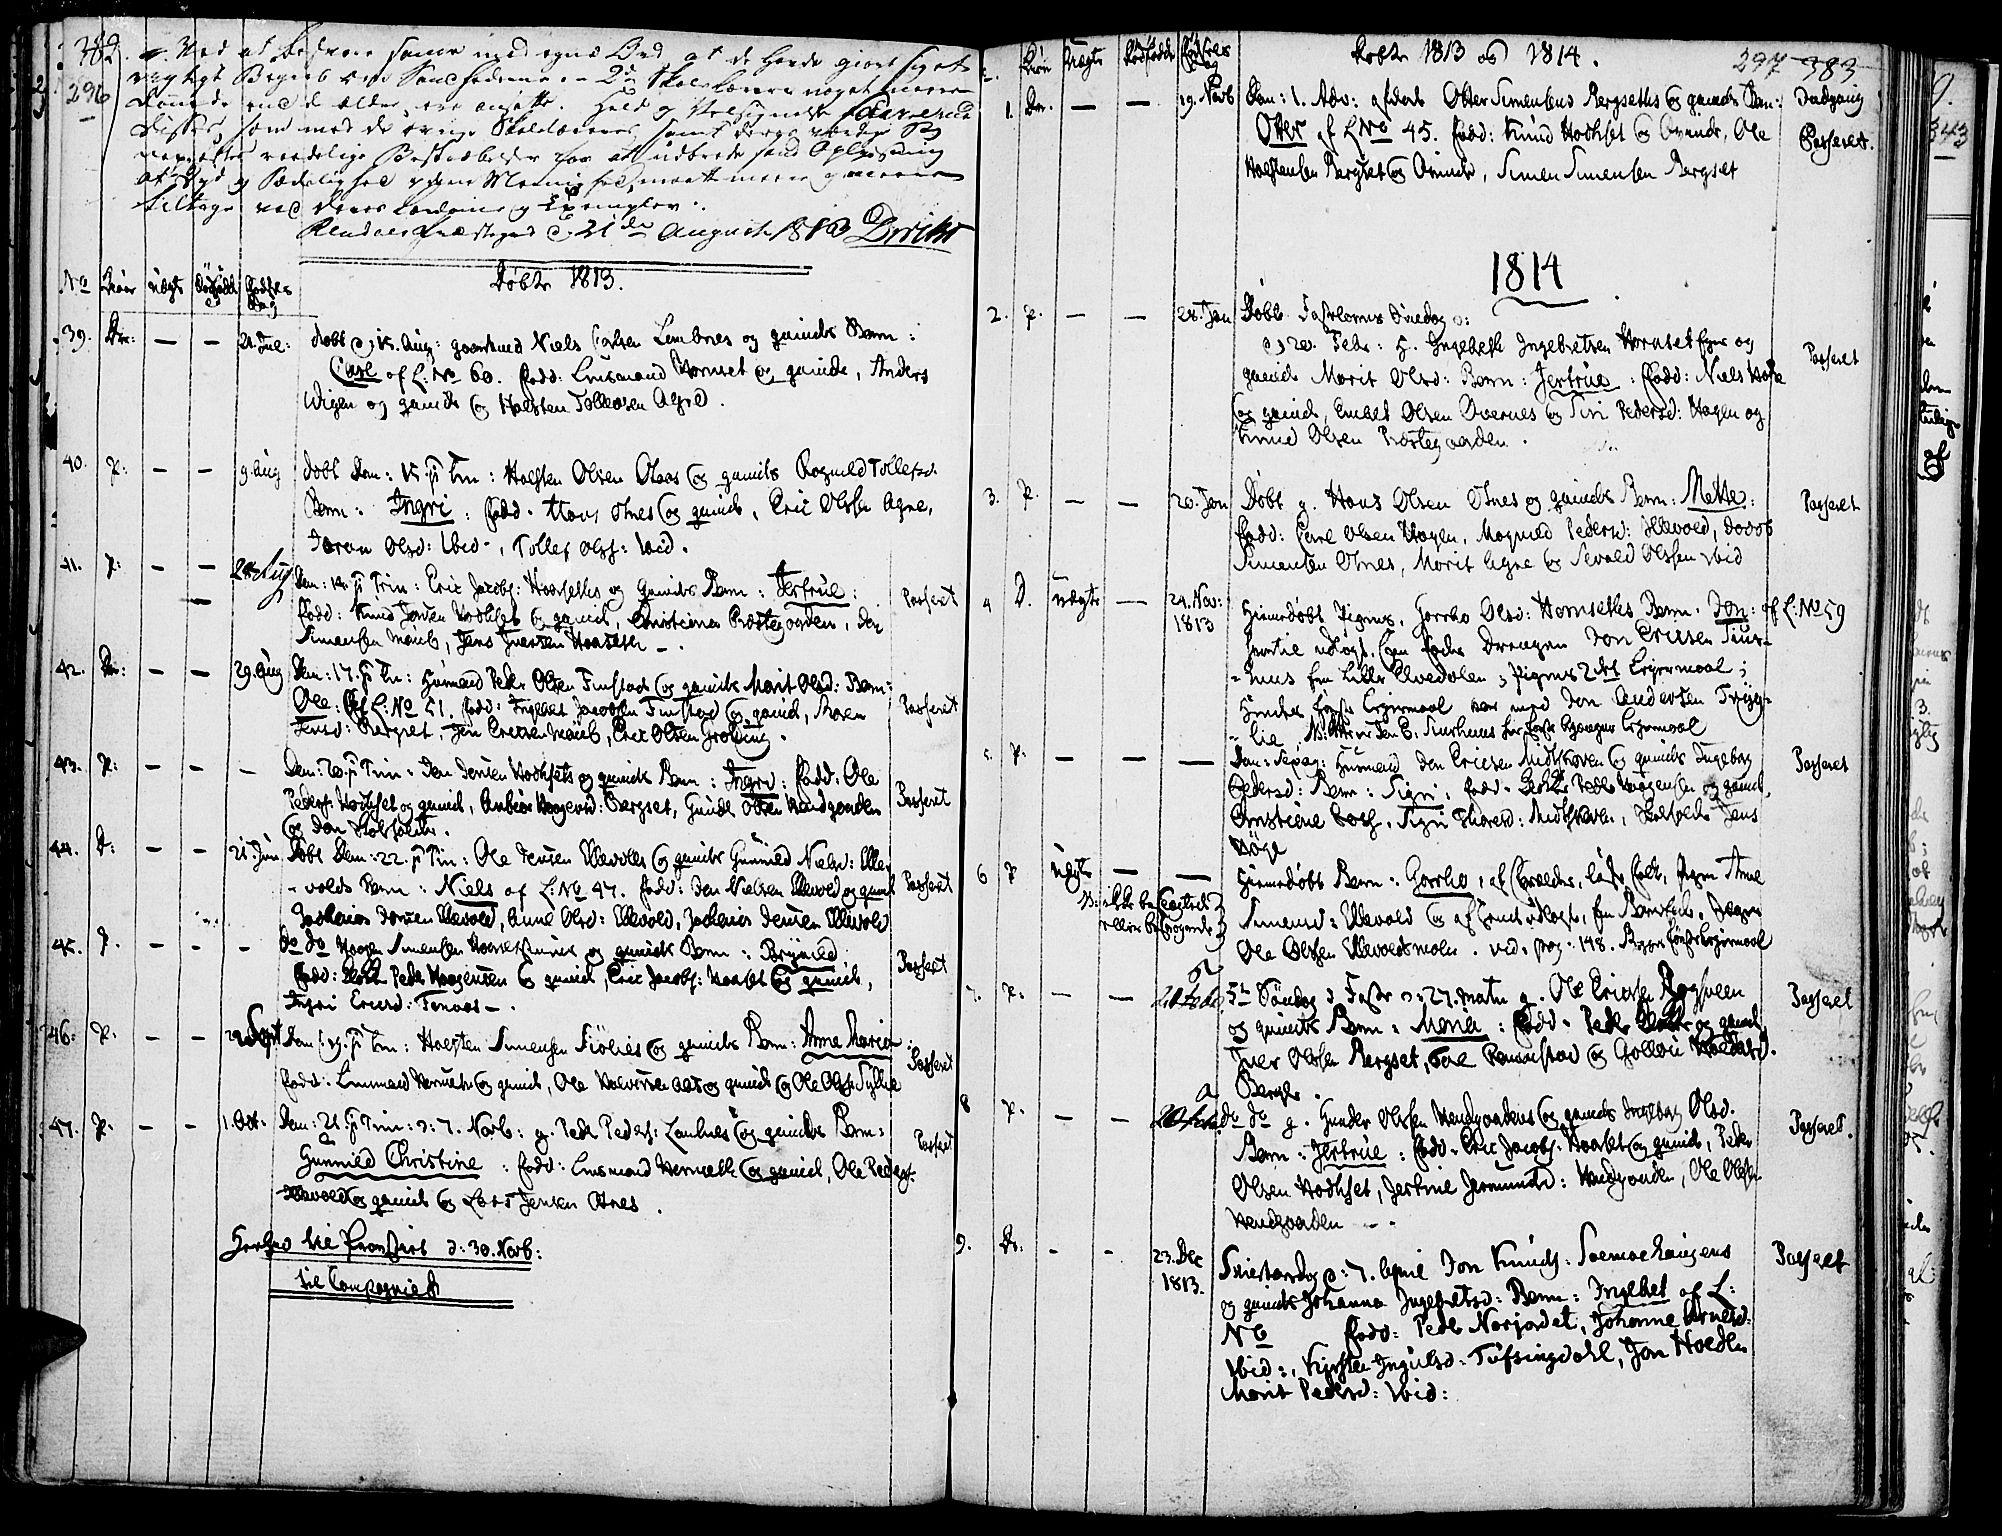 SAH, Rendalen prestekontor, H/Ha/Haa/L0002: Ministerialbok nr. 2, 1788-1814, s. 296-297